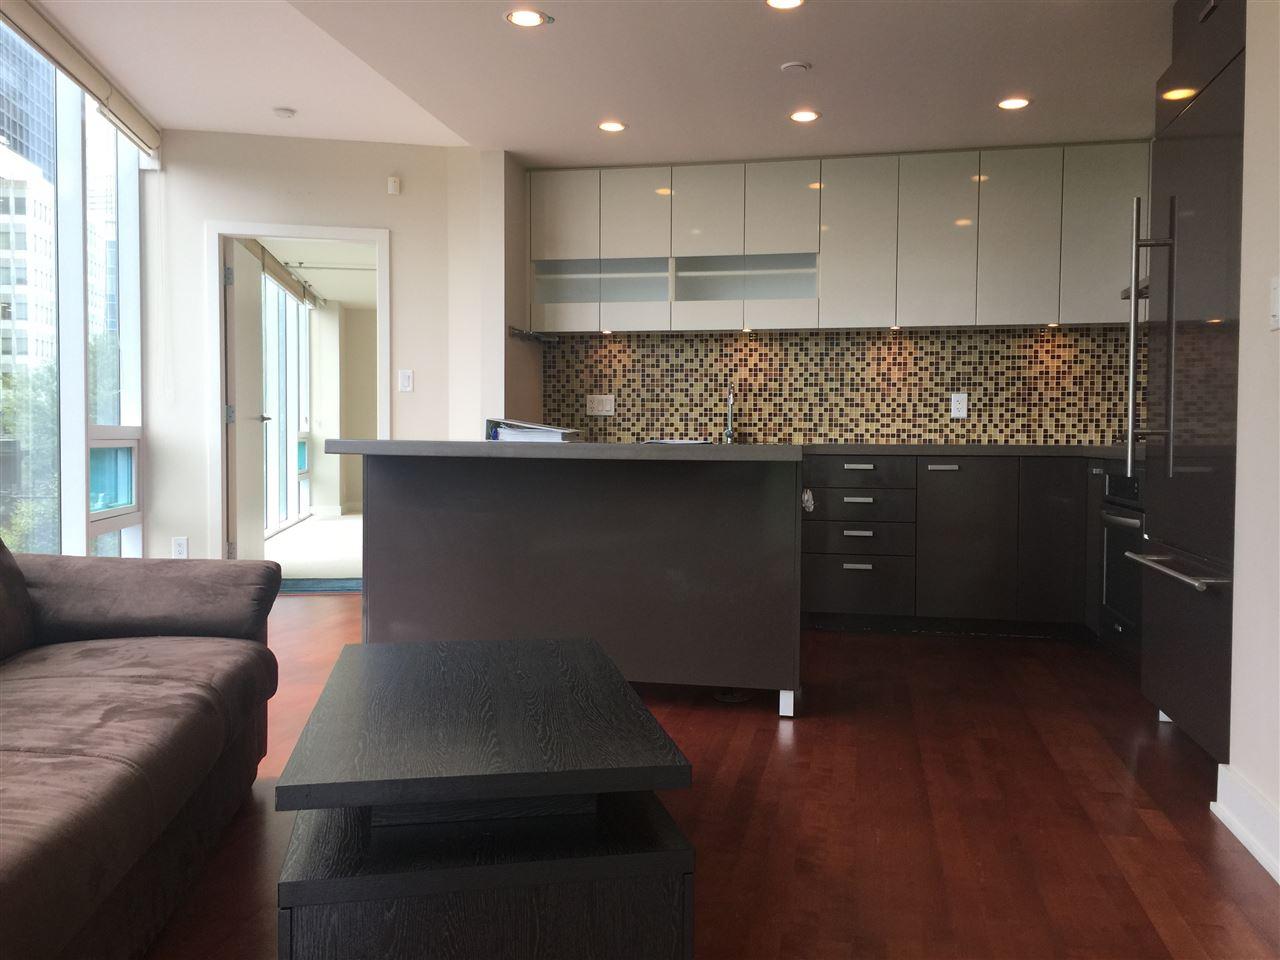 Condo Apartment at 301 1277 MELVILLE STREET, Unit 301, Vancouver West, British Columbia. Image 2